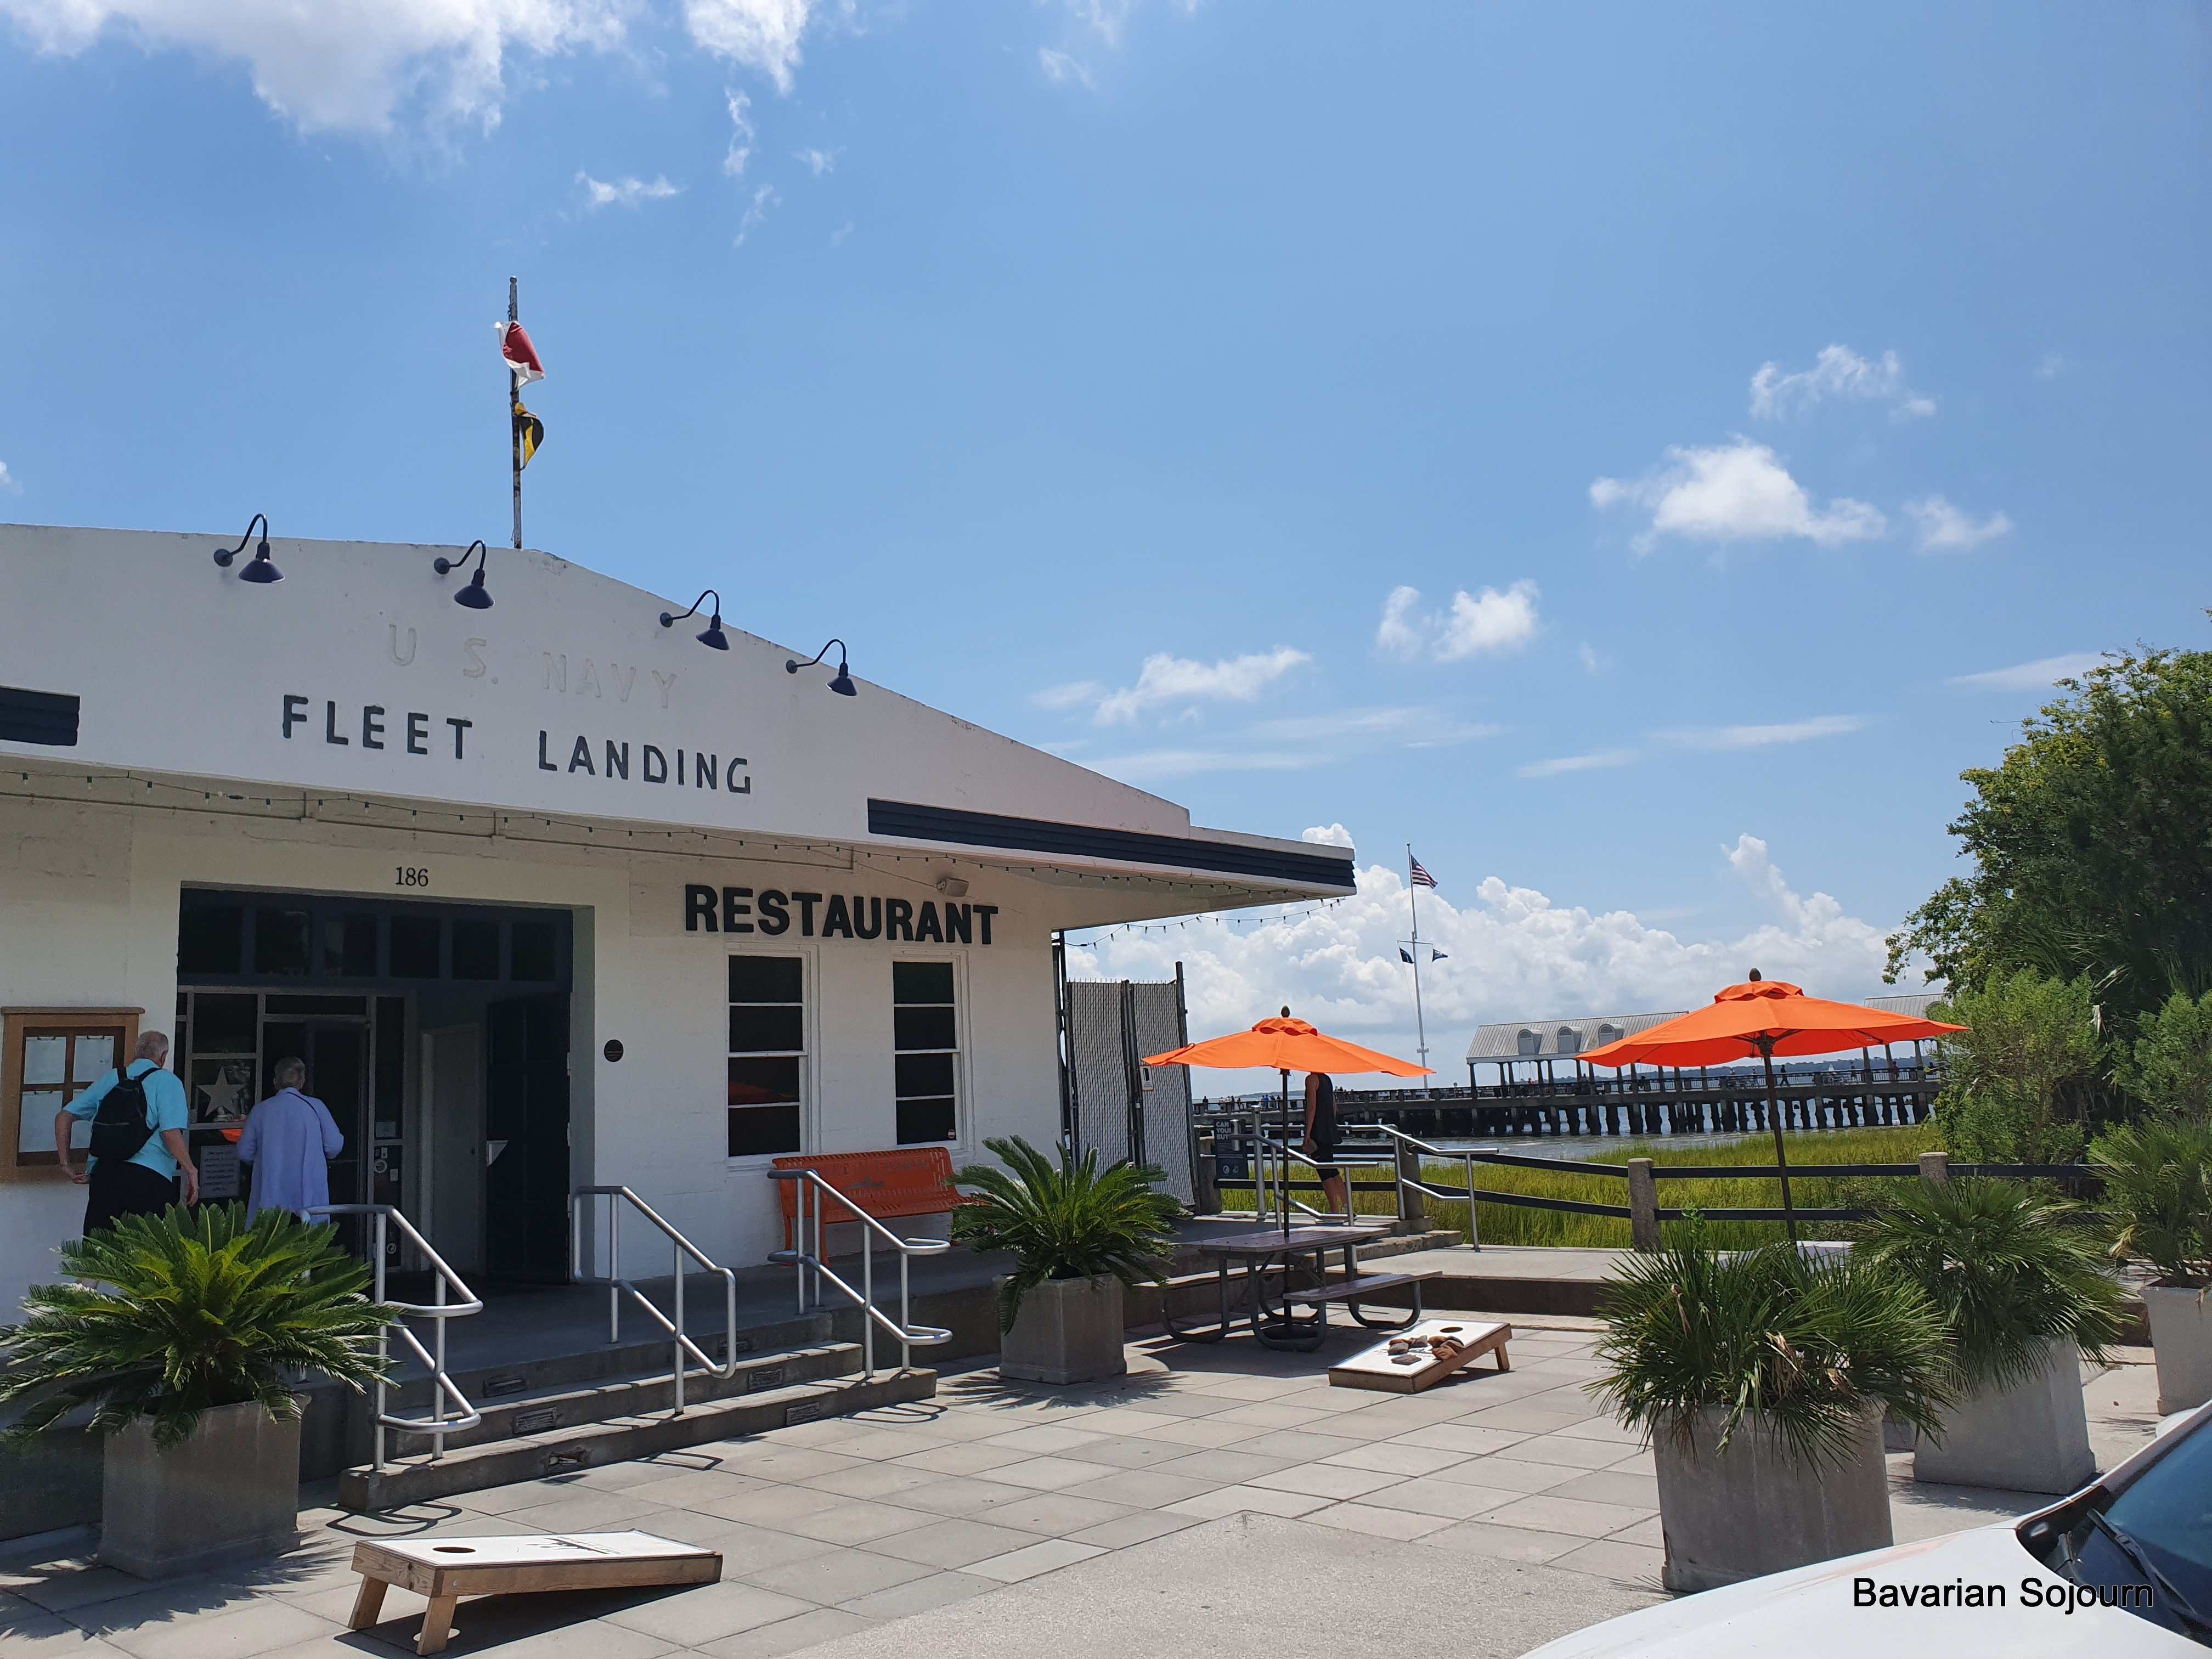 Fleet Landings